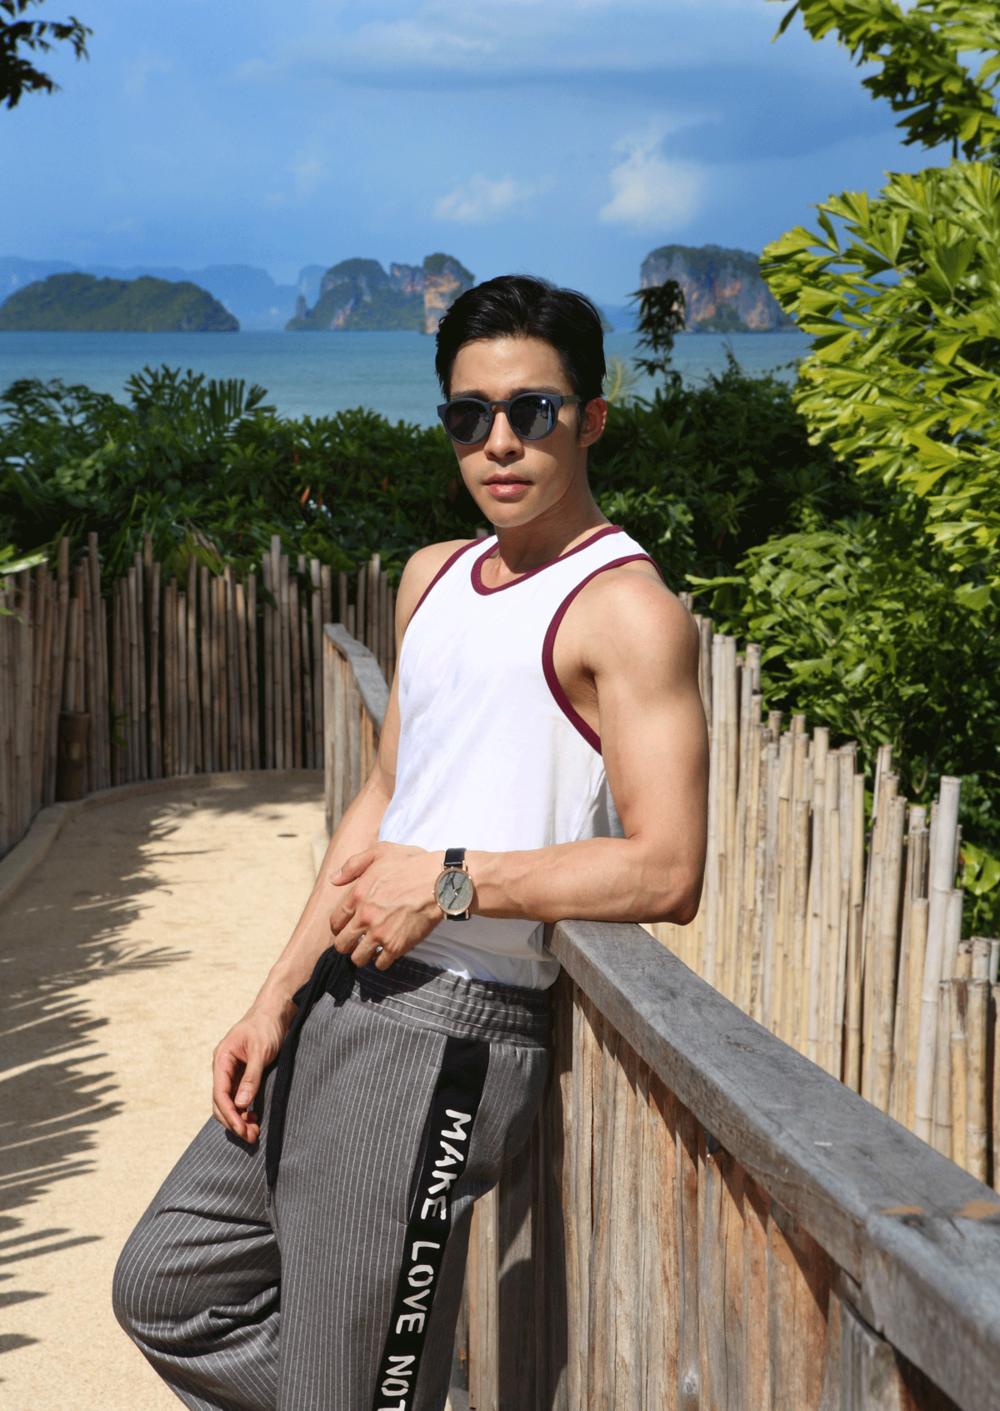 tank top : NOXX wear / pants : Everyday Km Km / sunglasses : GLAZZIQ / watch : FORREST